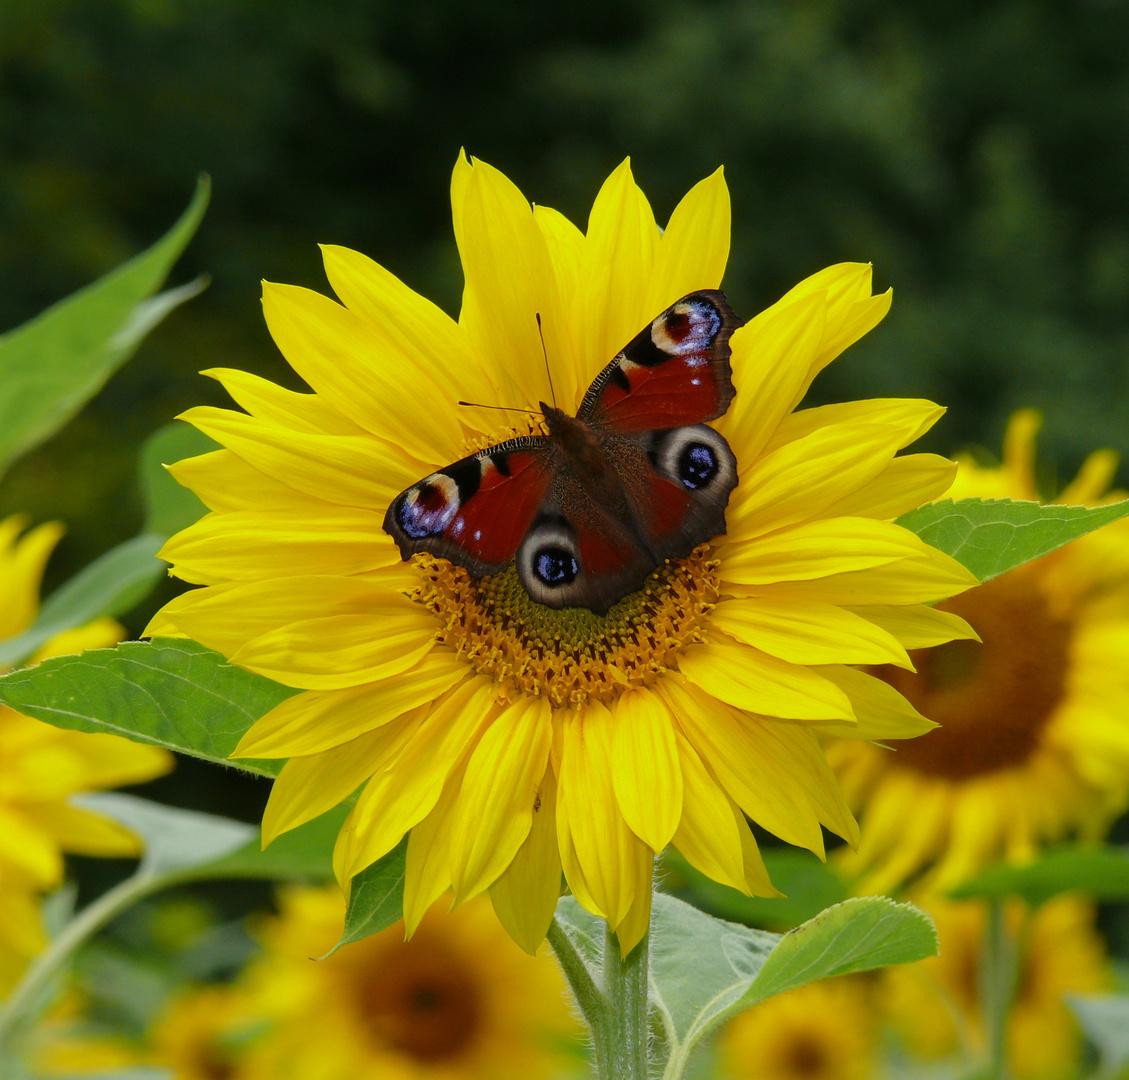 Pfauenauge auf Sonnenblume